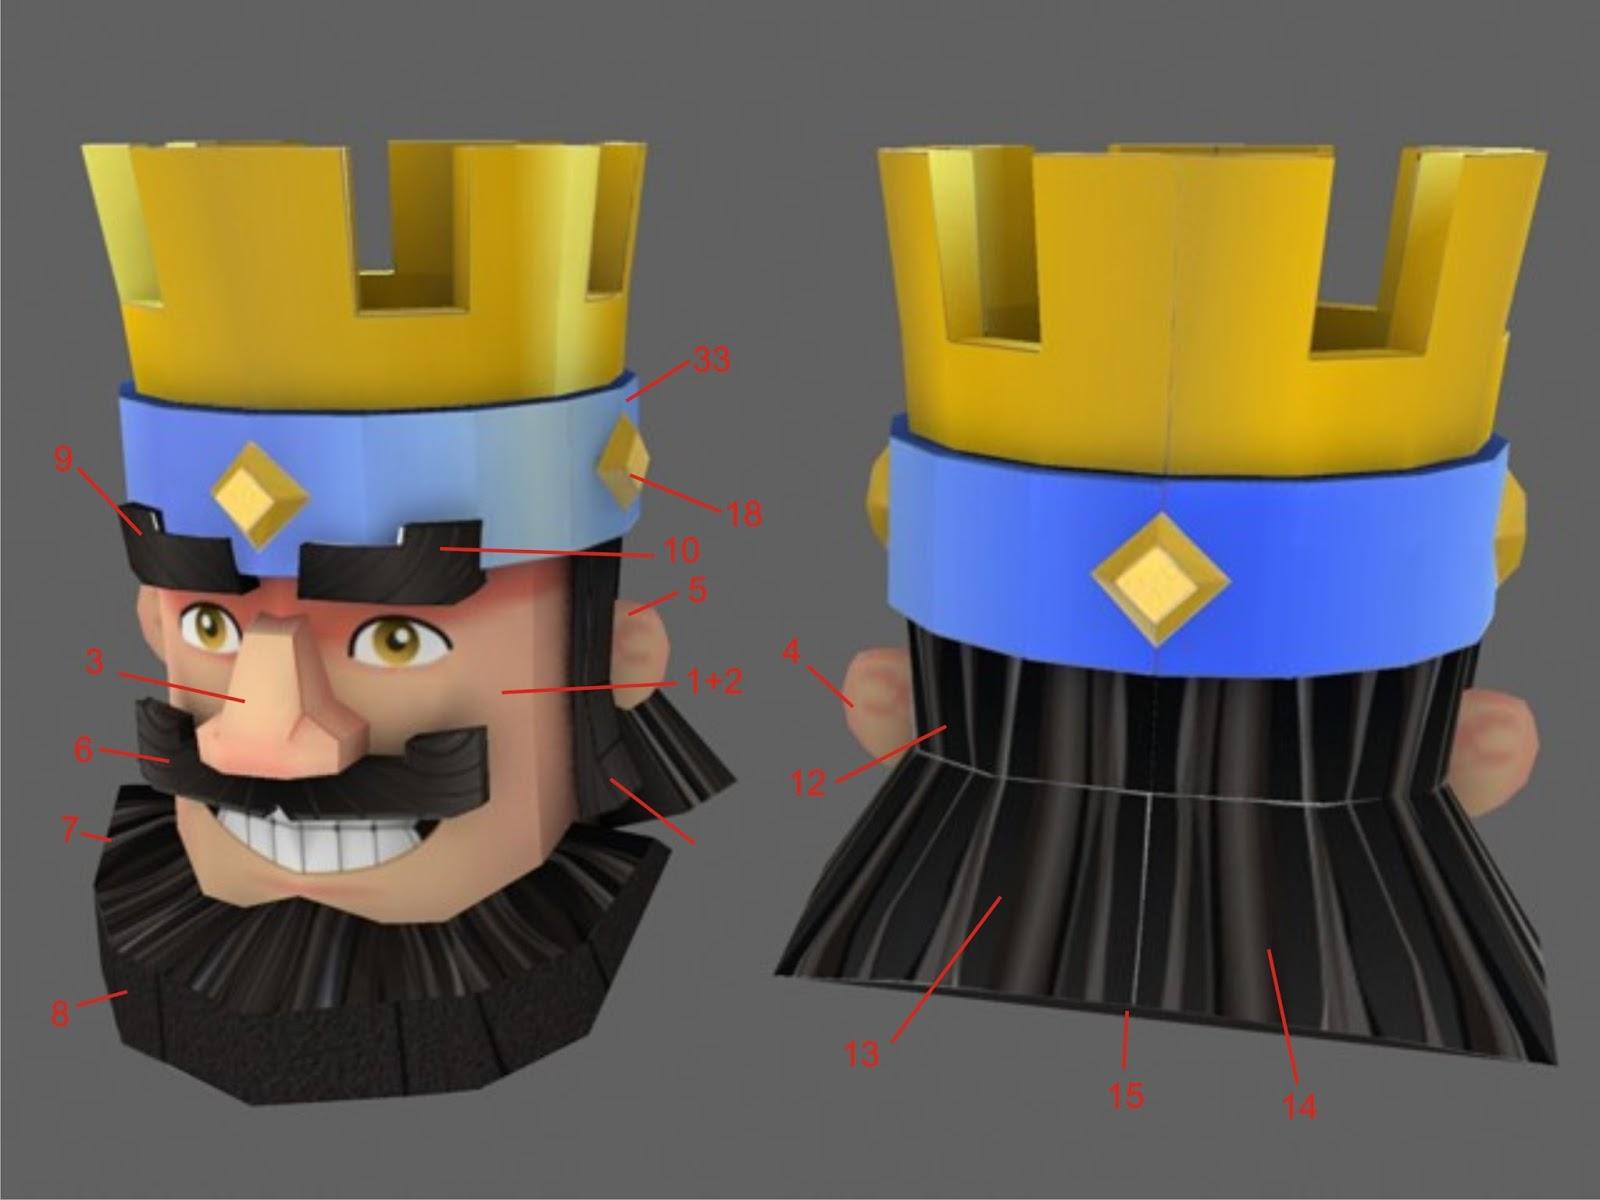 Clash Royale Papercraft - The King   Bamboogila Papercraft